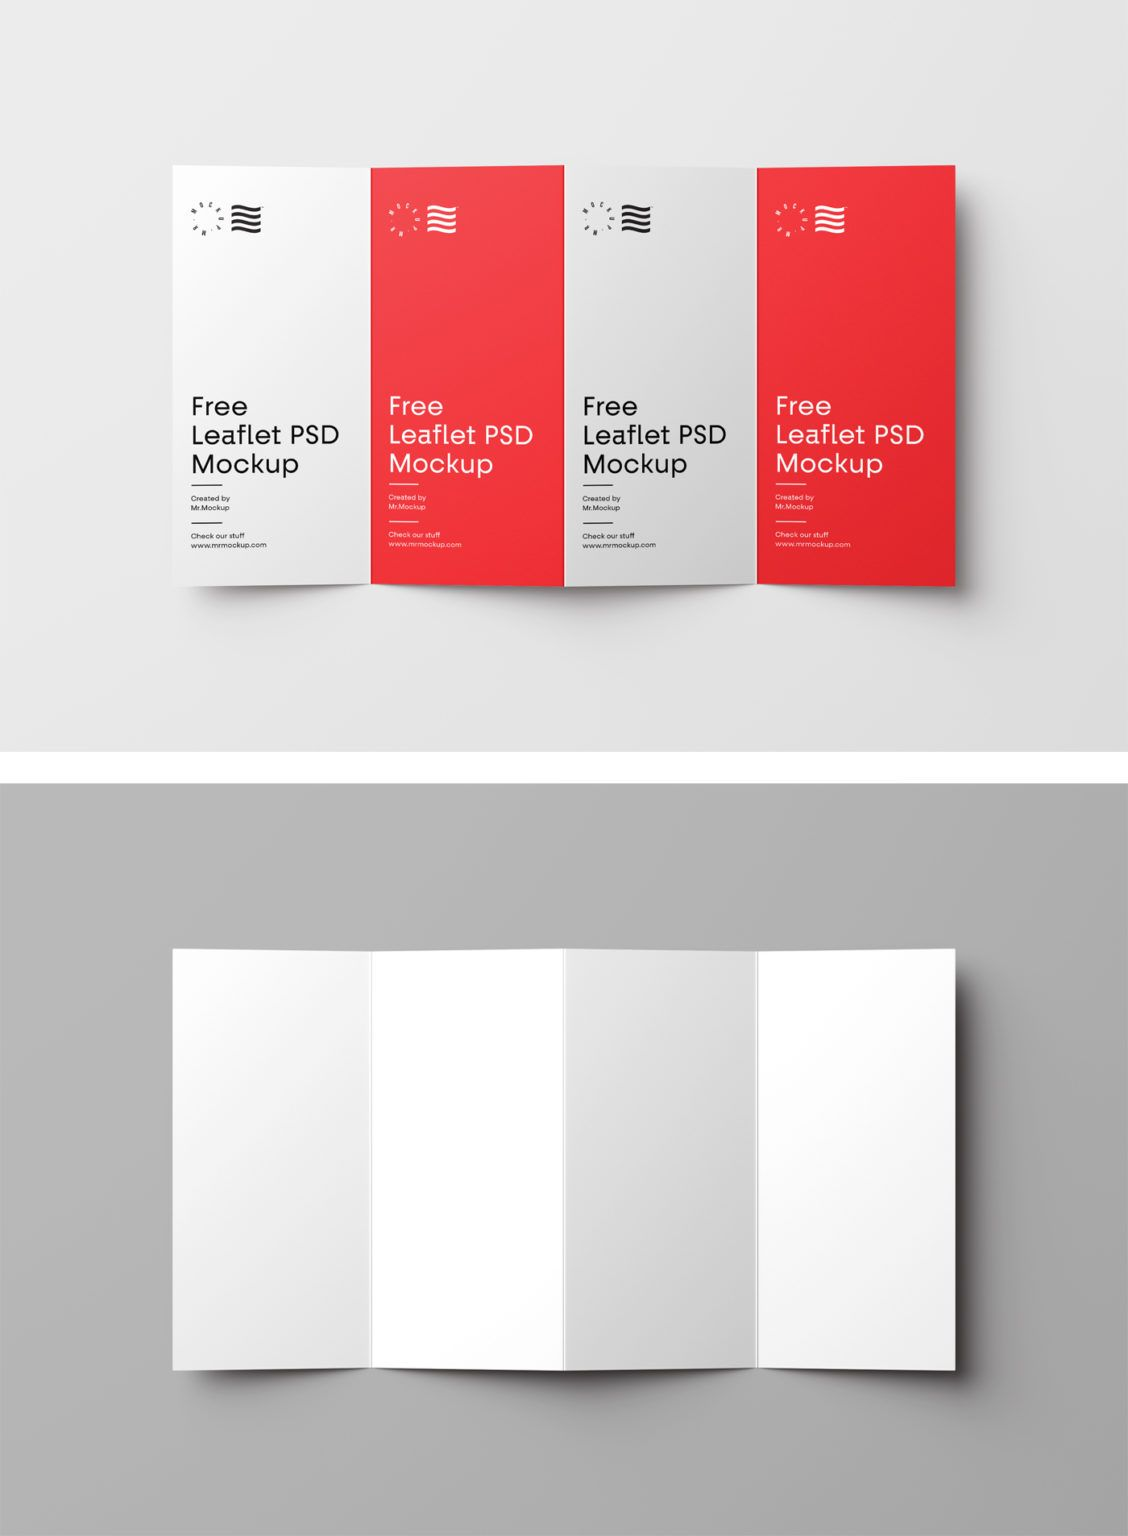 4 Fold Brochure Mockup Mr Mockup Graphic Design Freebies Graphic Design Freebies Brochure Mockup Psd Branding Mockups Free